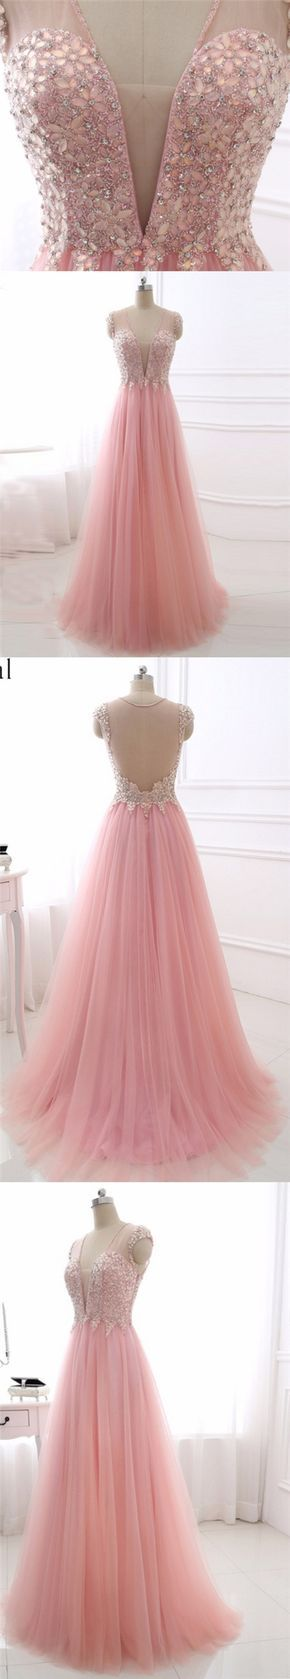 Pink Chic Prom Dresses V-neck Floor-length Tulle Rhinestone Prom Dress/Evening Dress JKS125